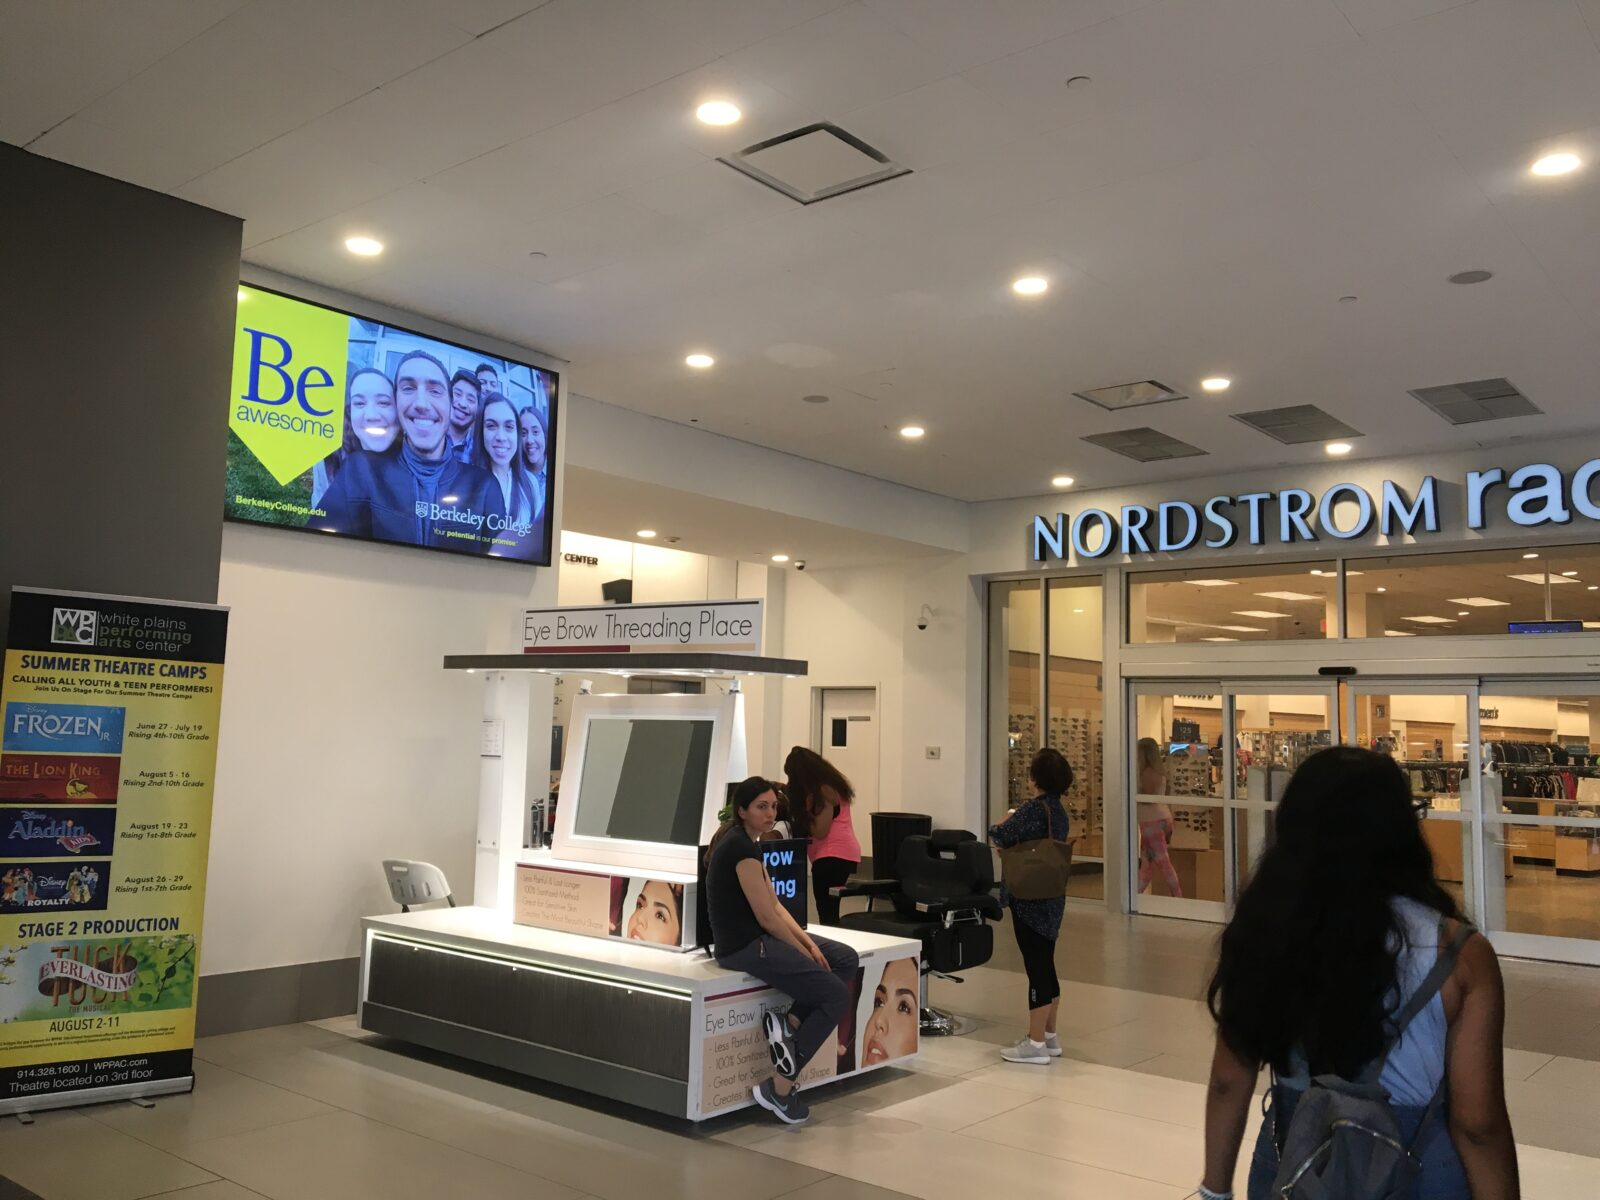 Berkeley College City Center Large Digital Display Advertising